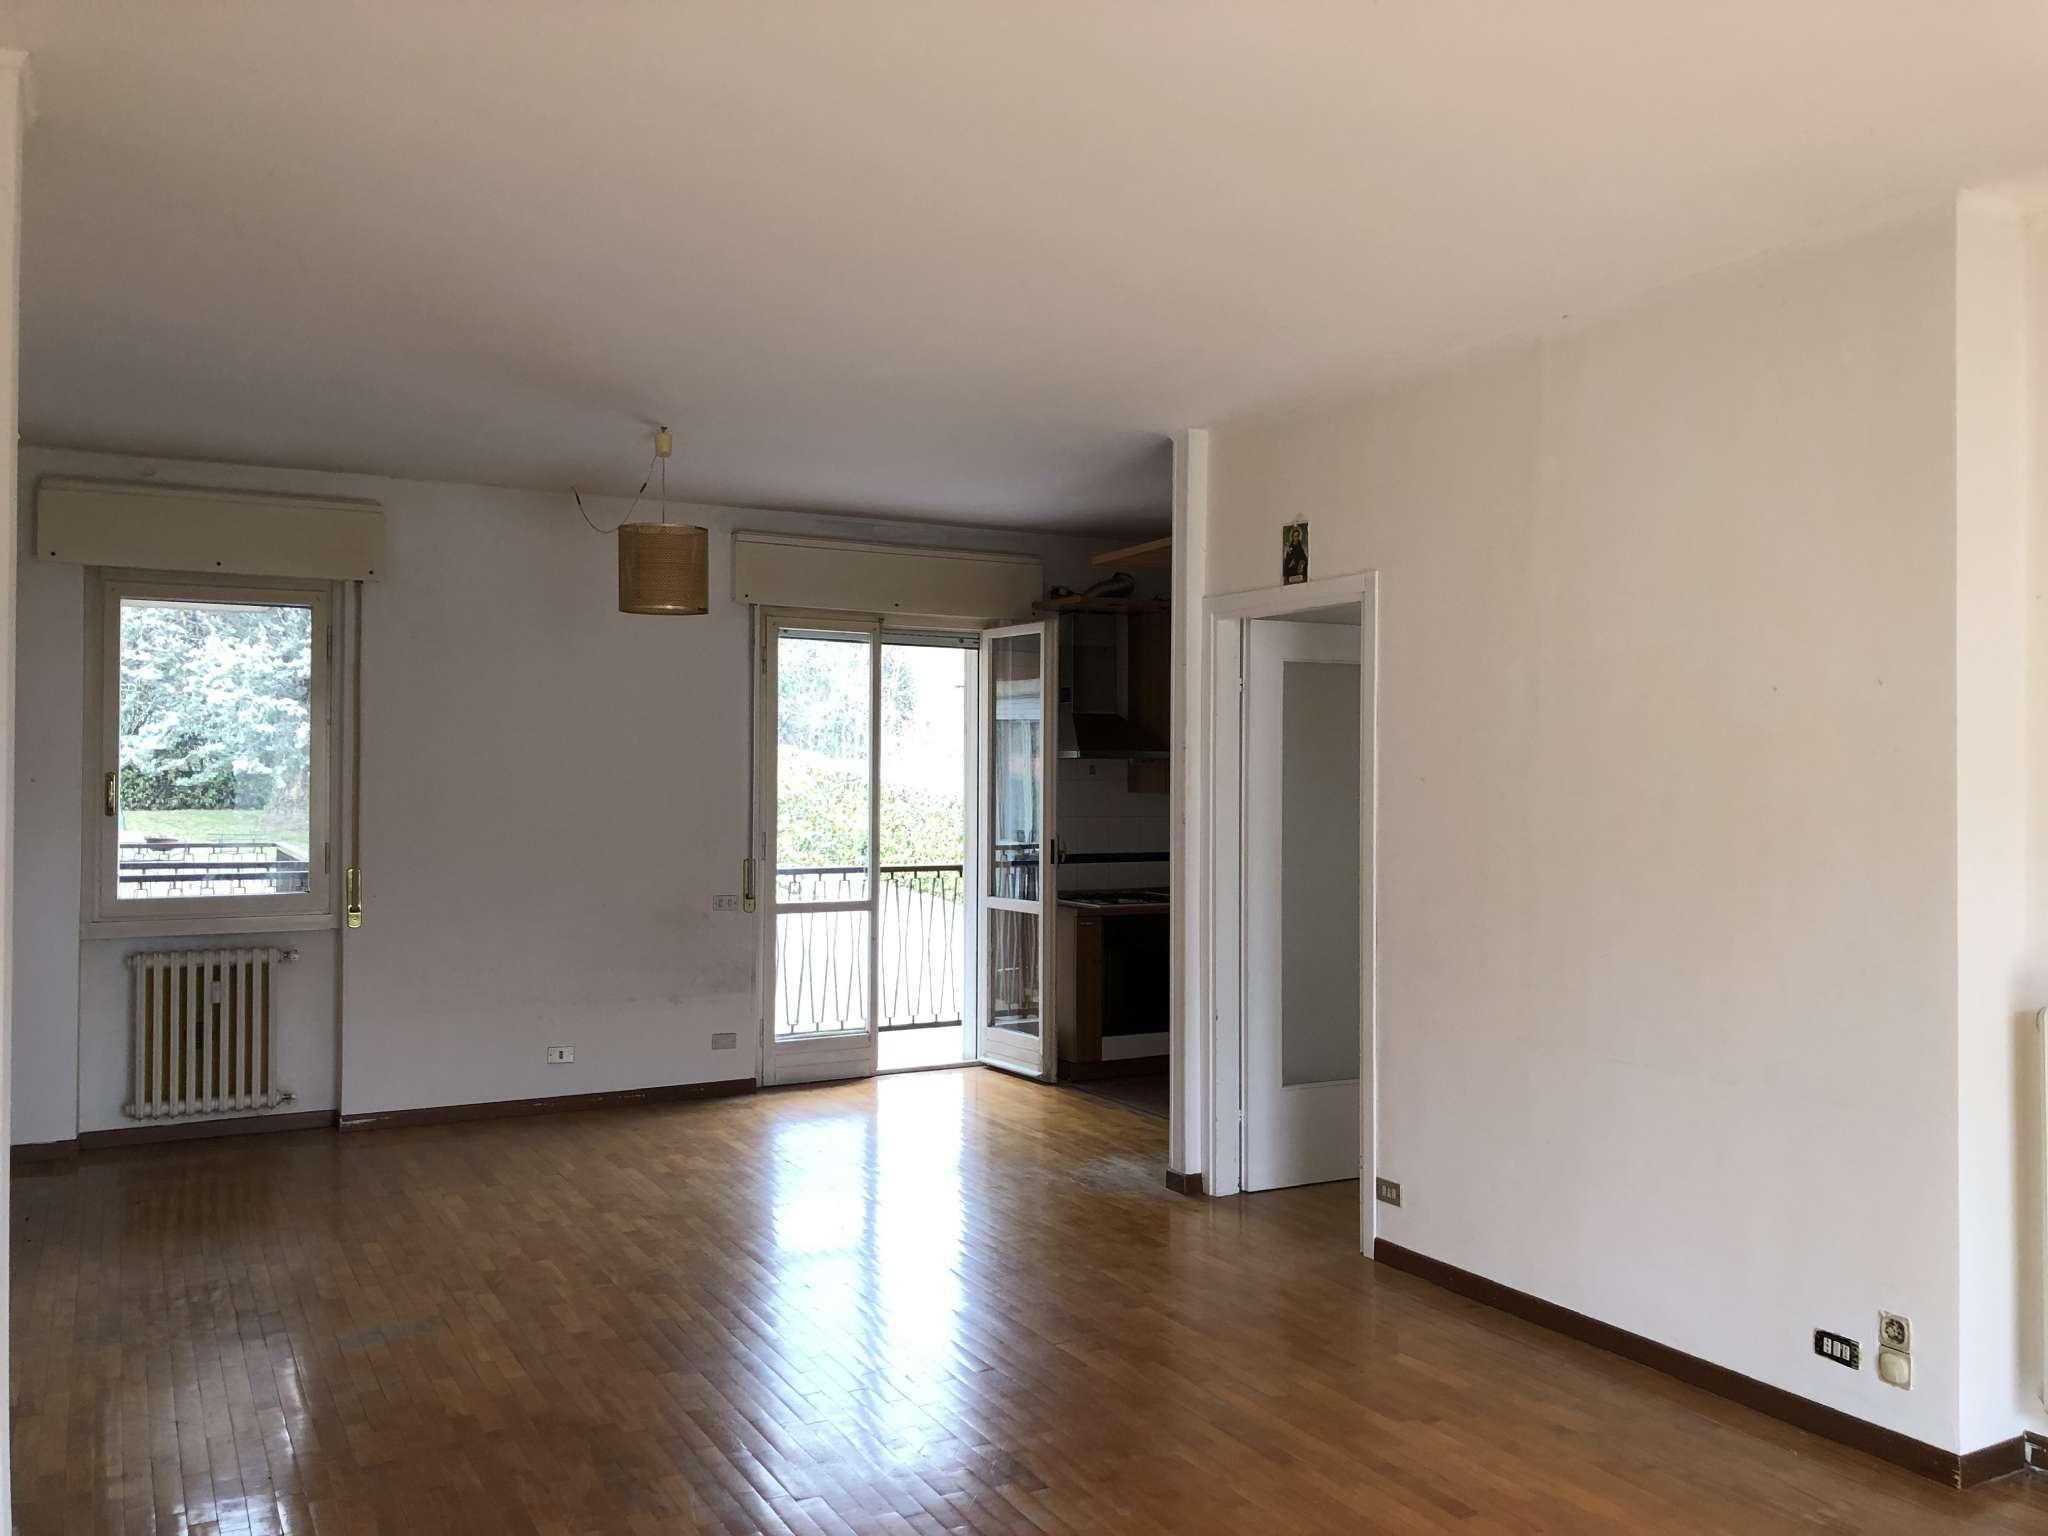 barasso vendita quart:  immobiliare euromed gavirate s.a.s